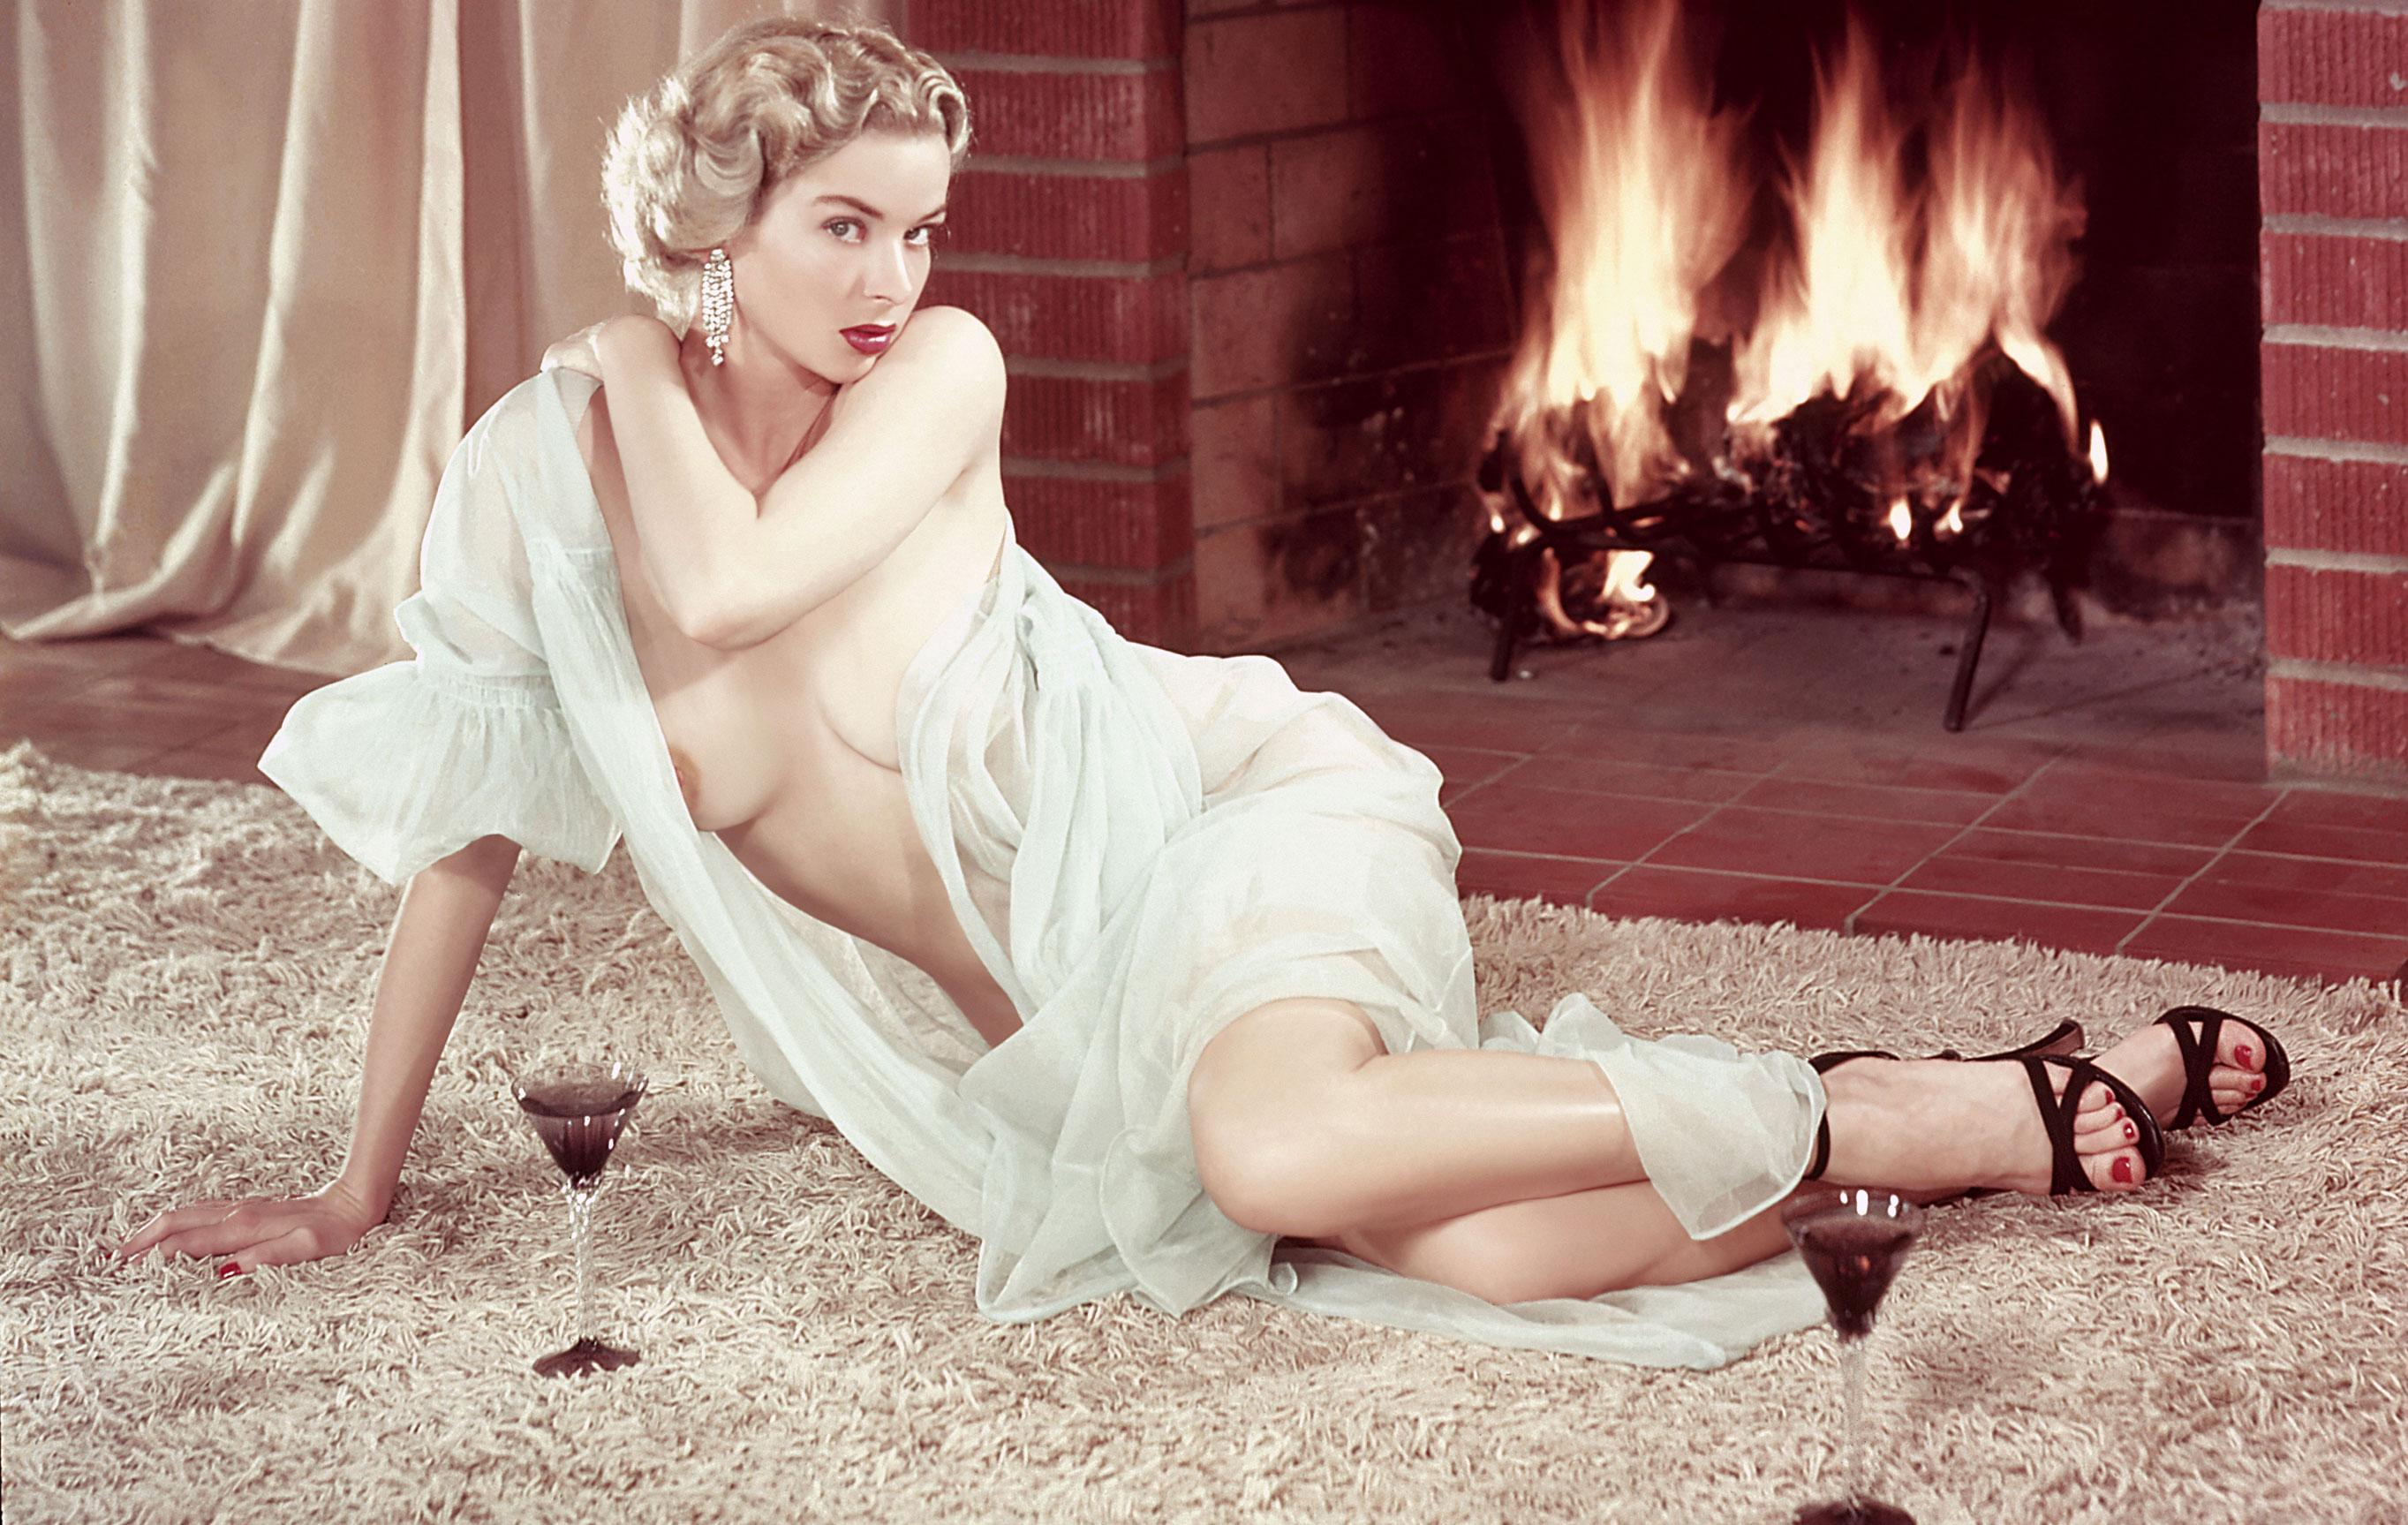 Playboy Playmate - Miss June 1955 | Eve Meyer / Ив Мейер